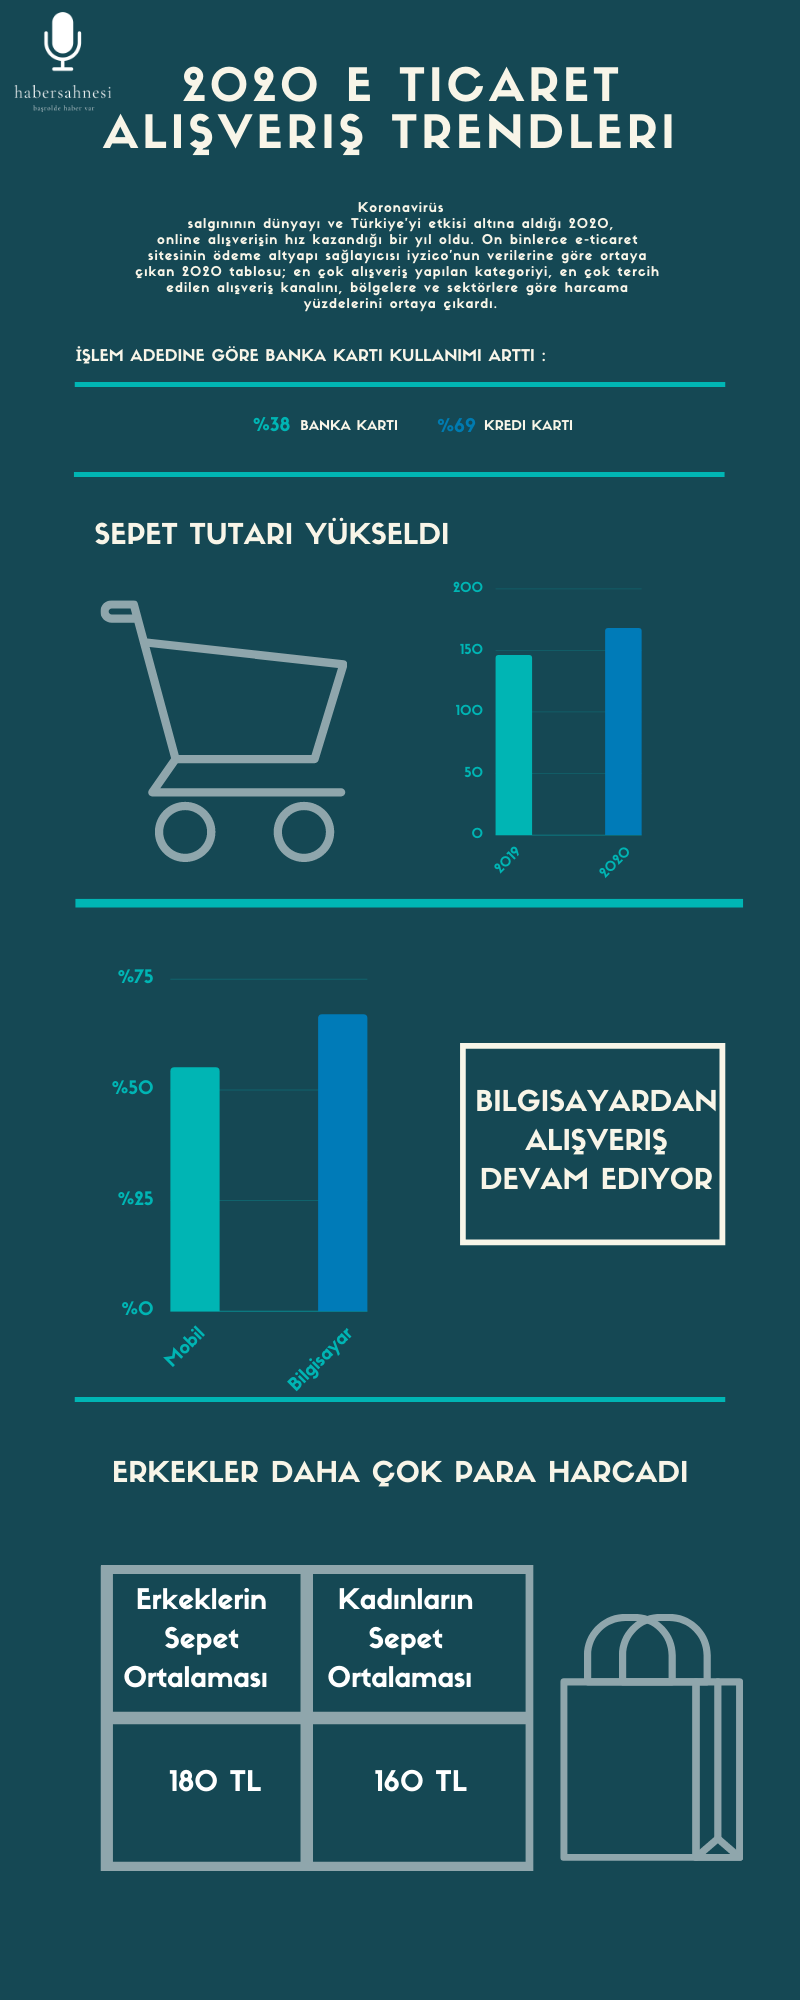 İyzico 2020 E ticaret Alışveriş Trendleri